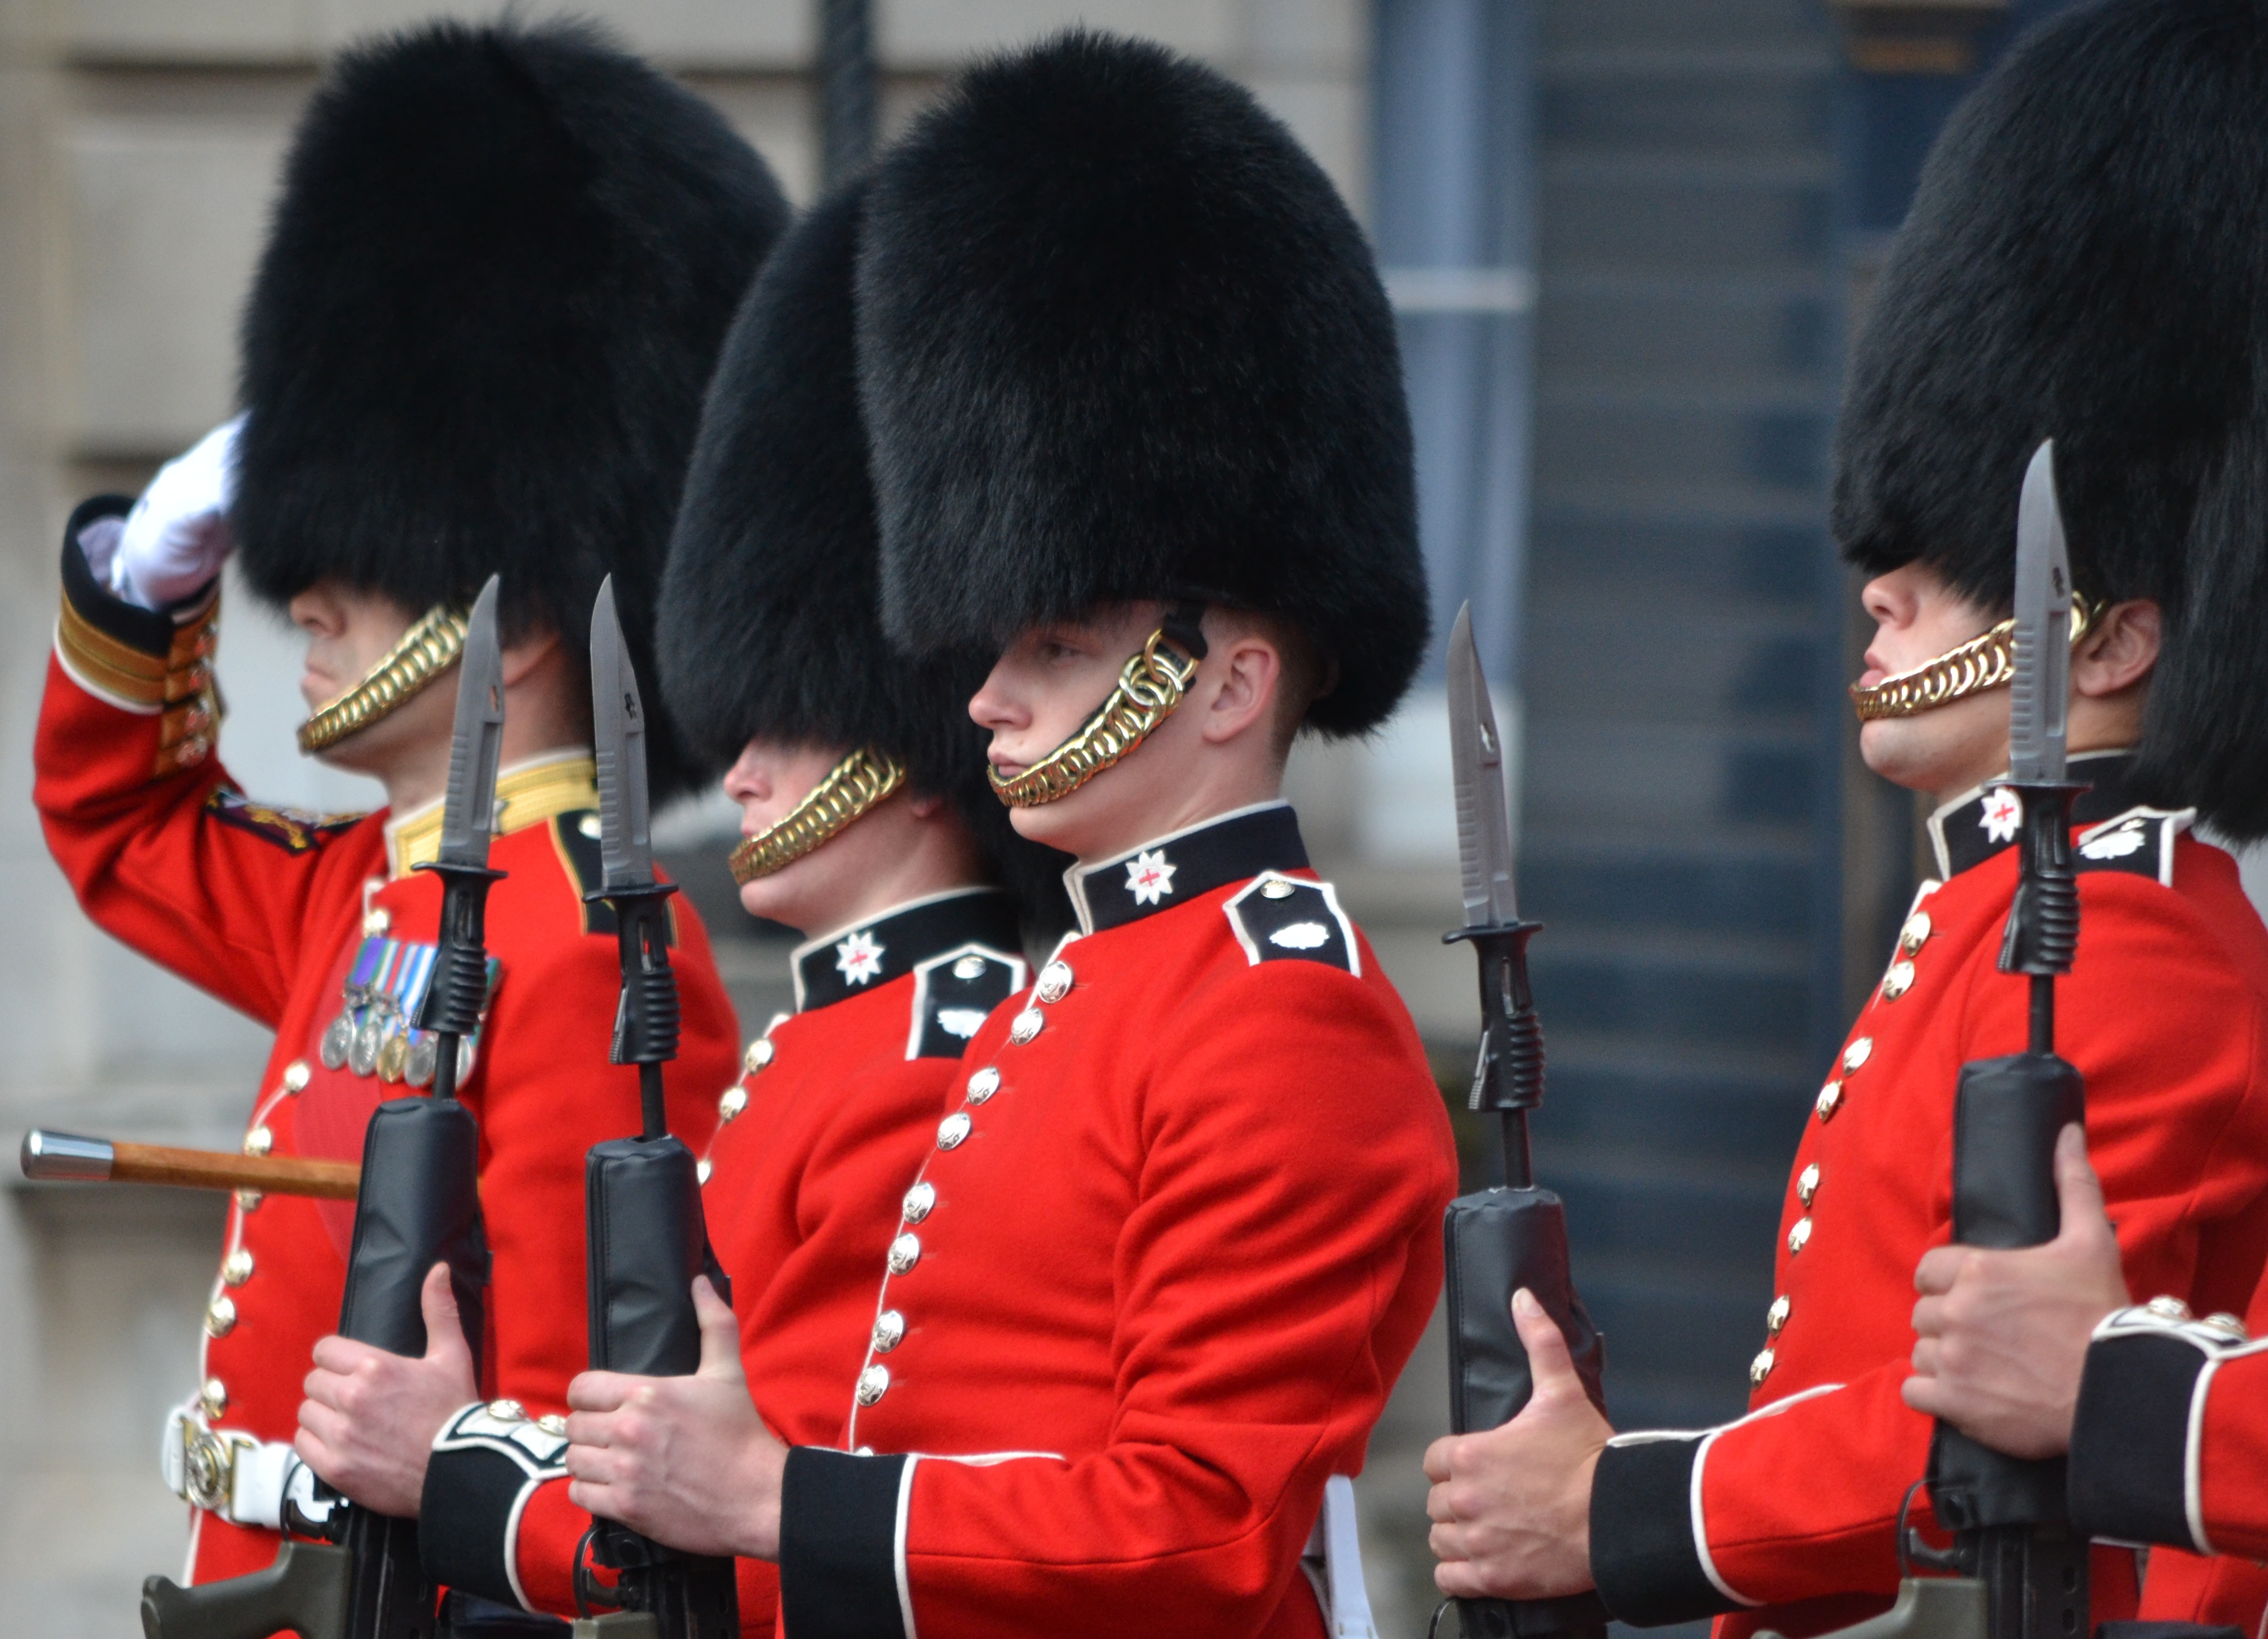 The Summer Opening of Buckingham Palace |Buckingham Palace Guards Hats